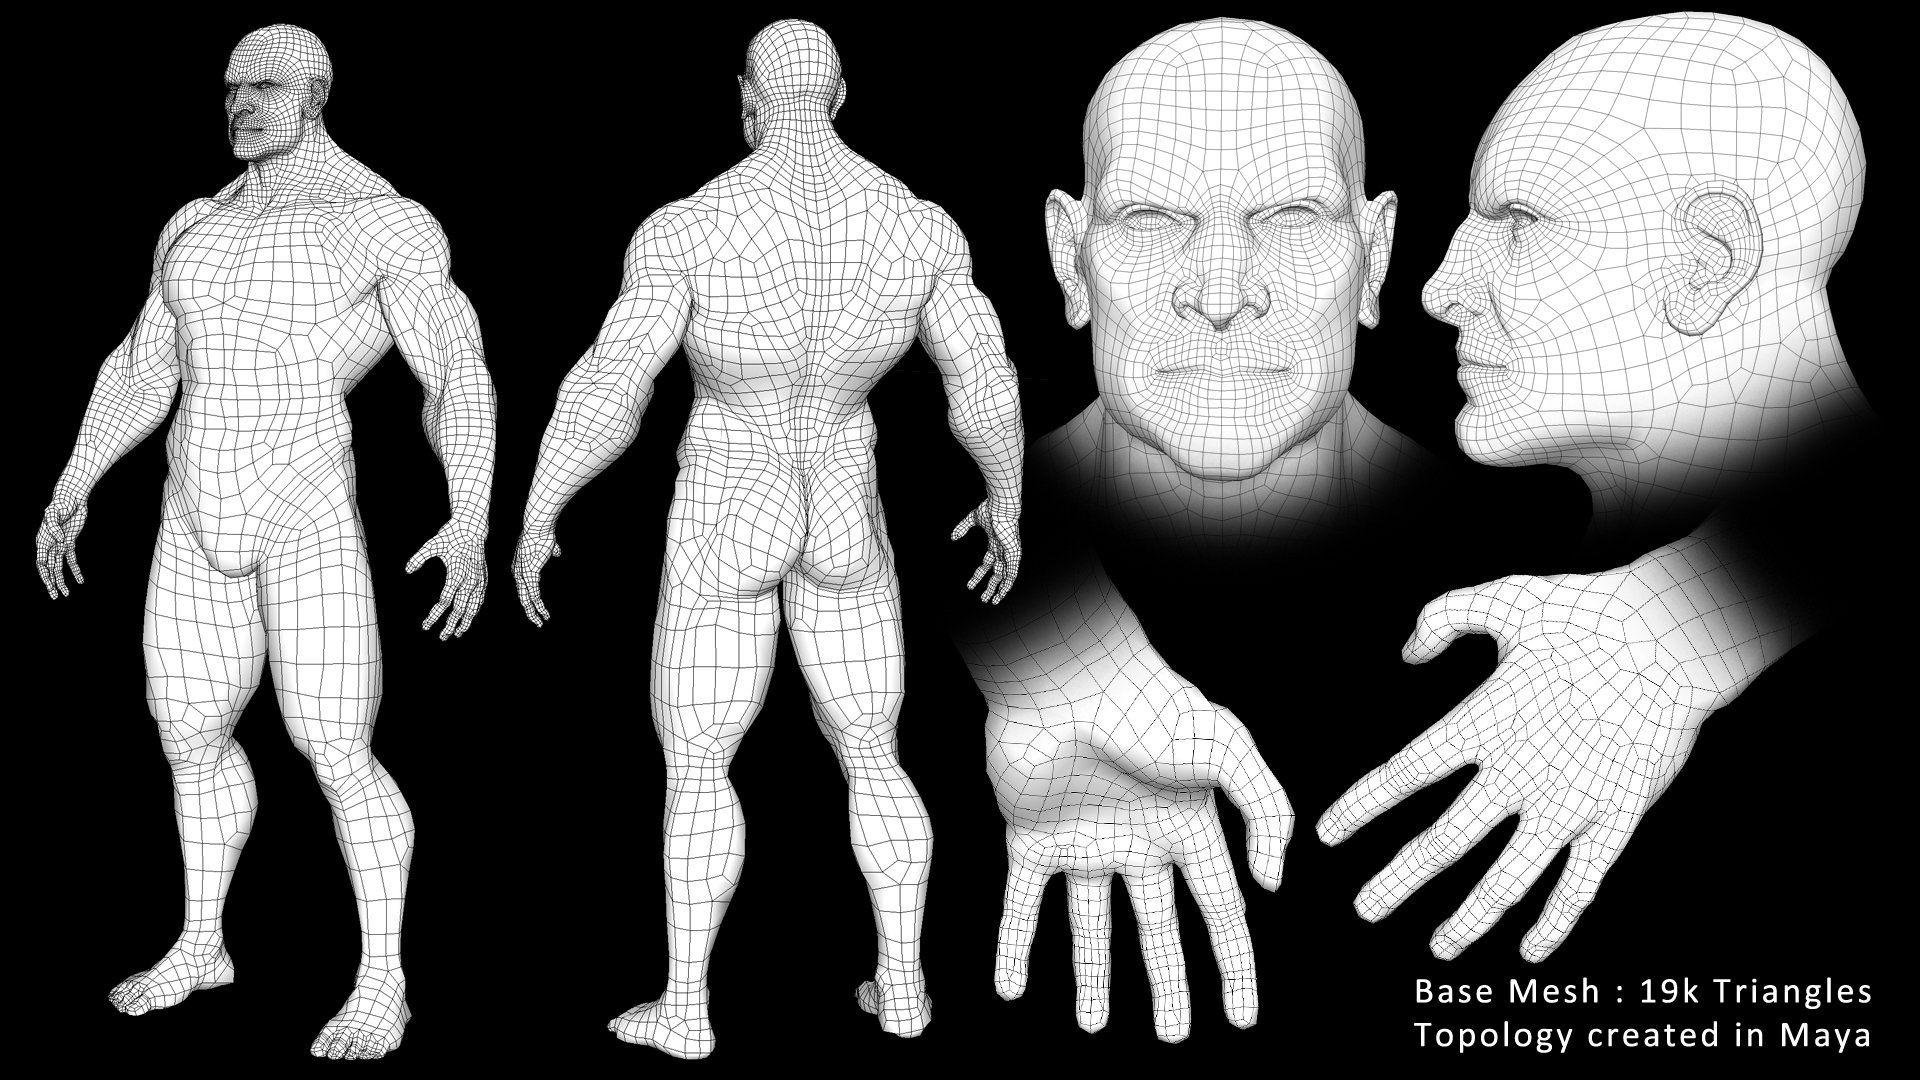 ArtStation - Male Anatomy Study, H Mason Holly | Blueprints 3D ...